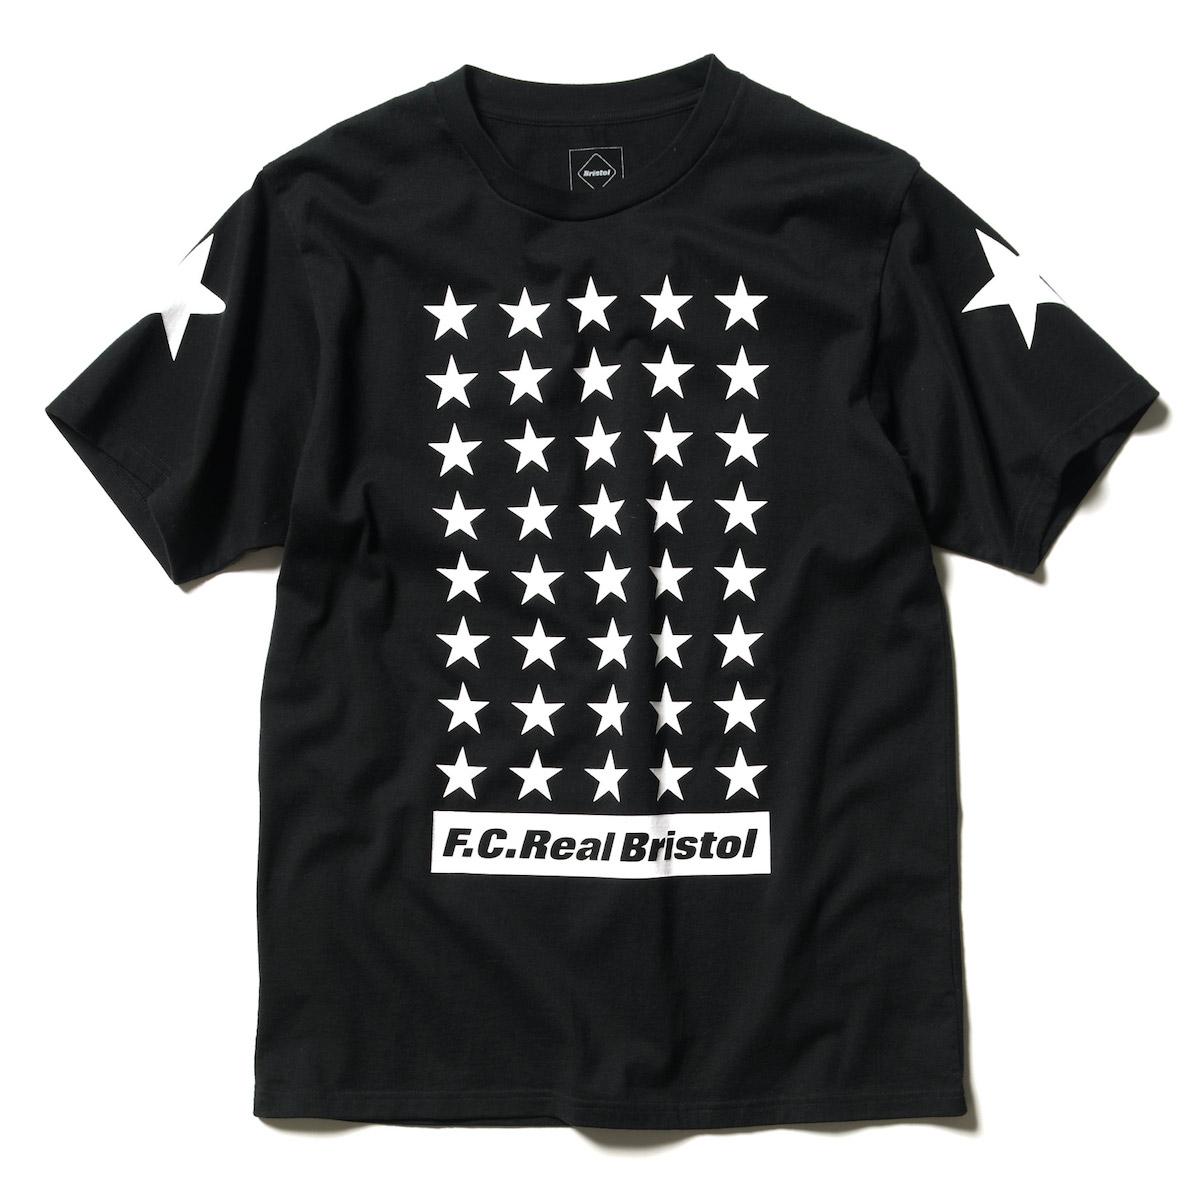 F.C.Real Bristol / 42 STARS TEE -Black